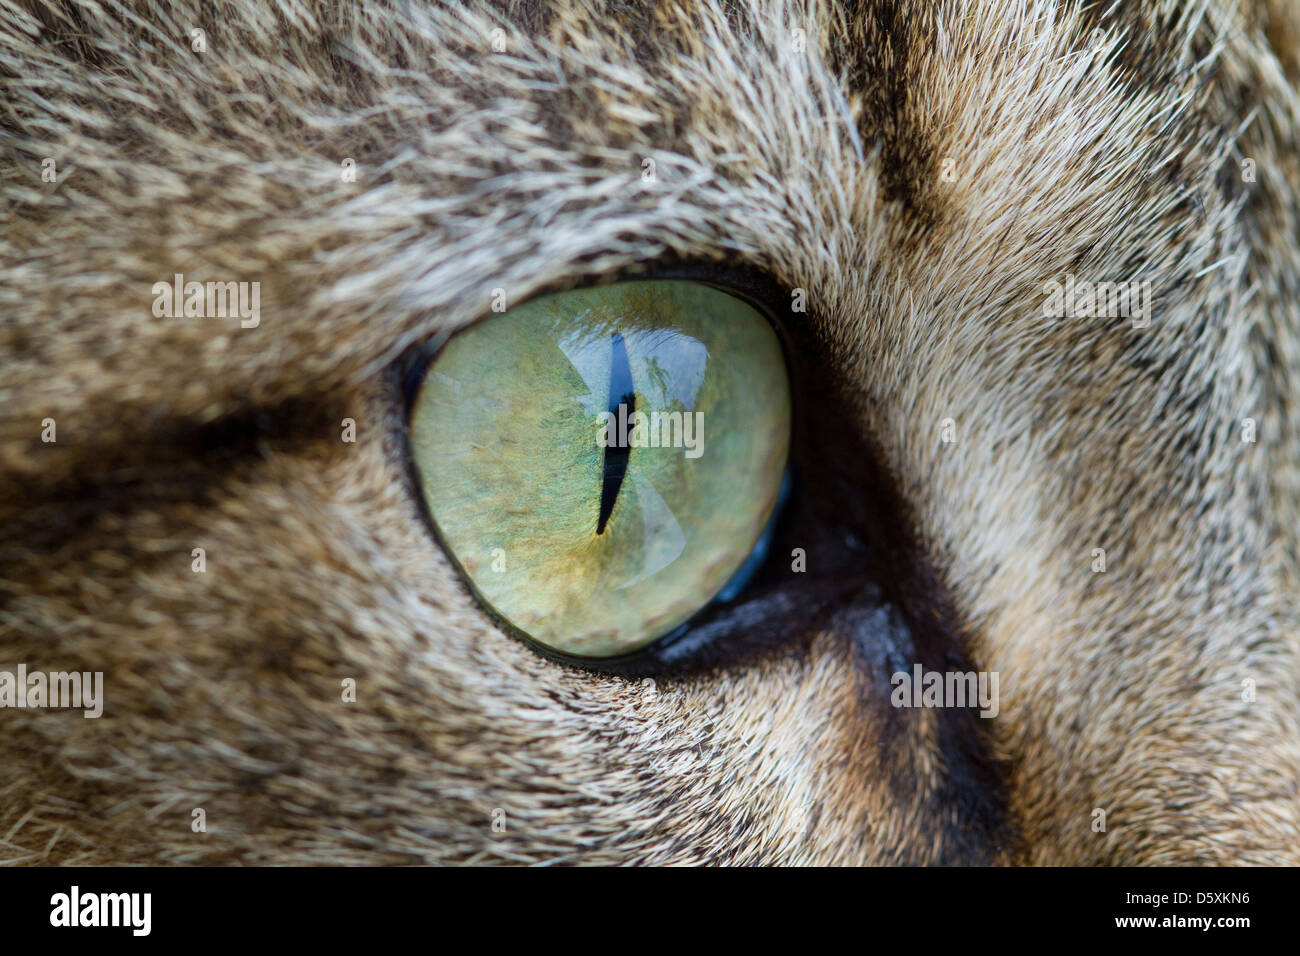 DOMESTIC CAT EYE - Stock Image